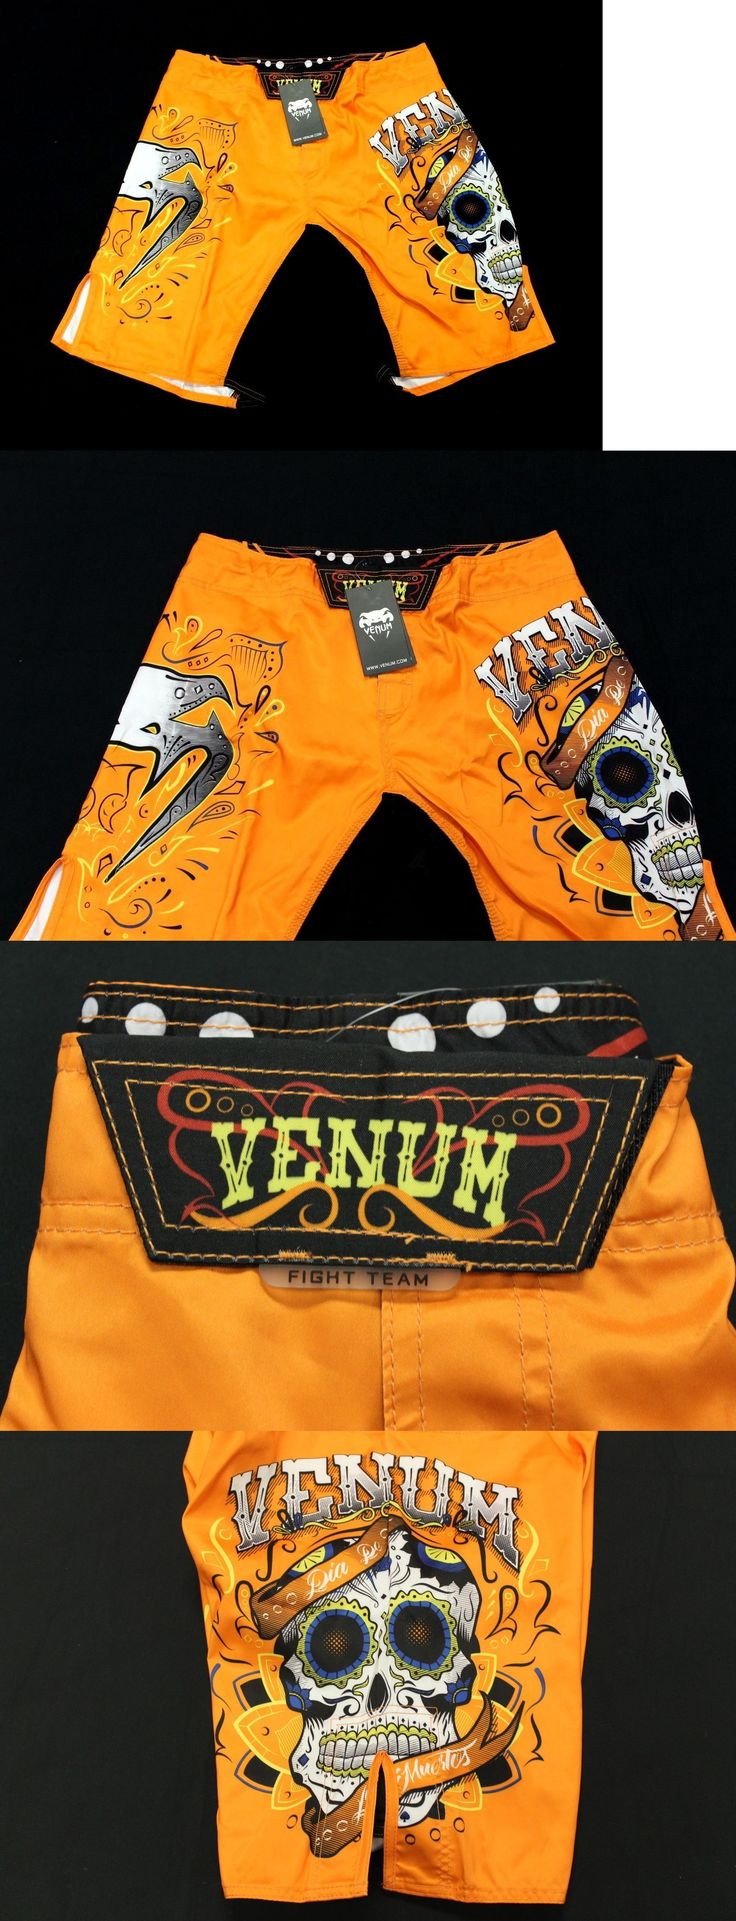 Other Combat Sport Clothing 73988: Venum Men S Santa Muerte 2.0 Fight Shorts Orange Gg8 Size Large Nwt -> BUY IT NOW ONLY: $54.99 on eBay!